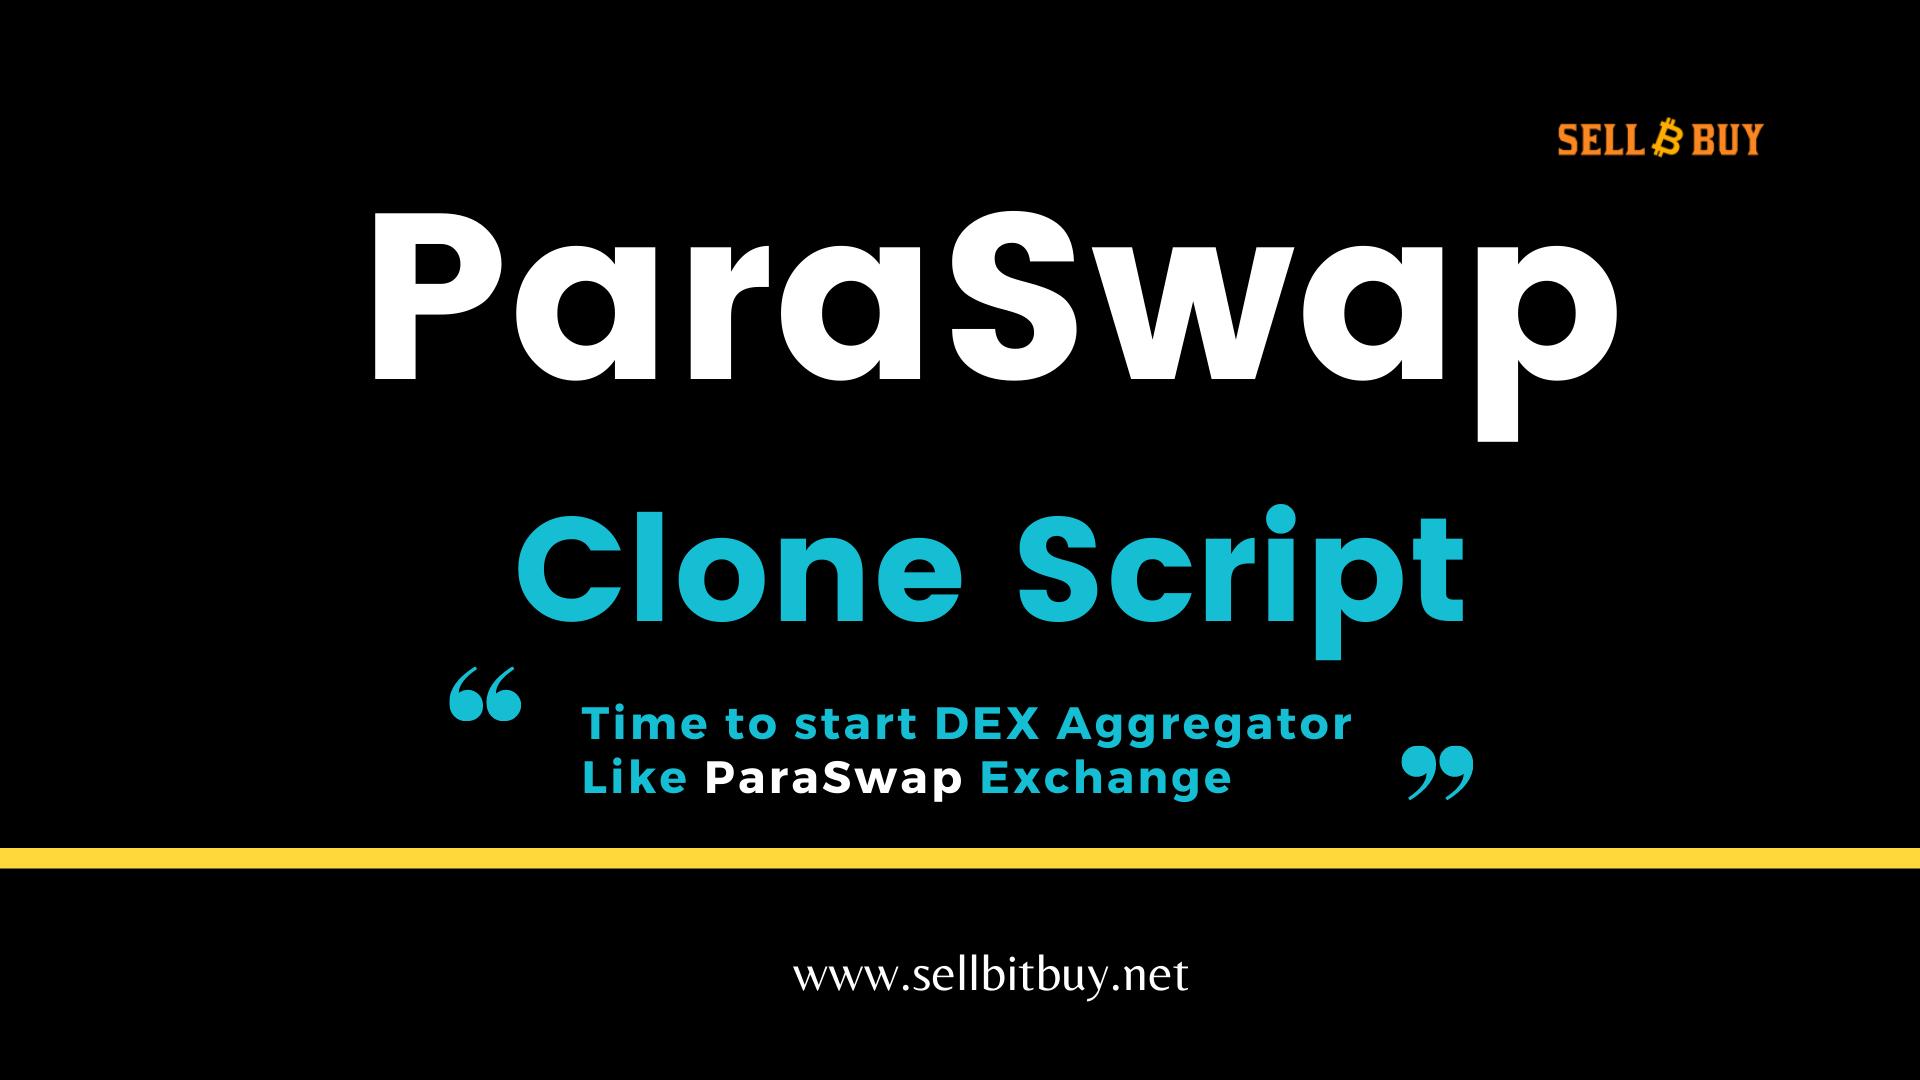 Paraswap Clone Script - A DeFi Solution To Launch a Billion Dollar Worth DeFi Aggrgator Platform